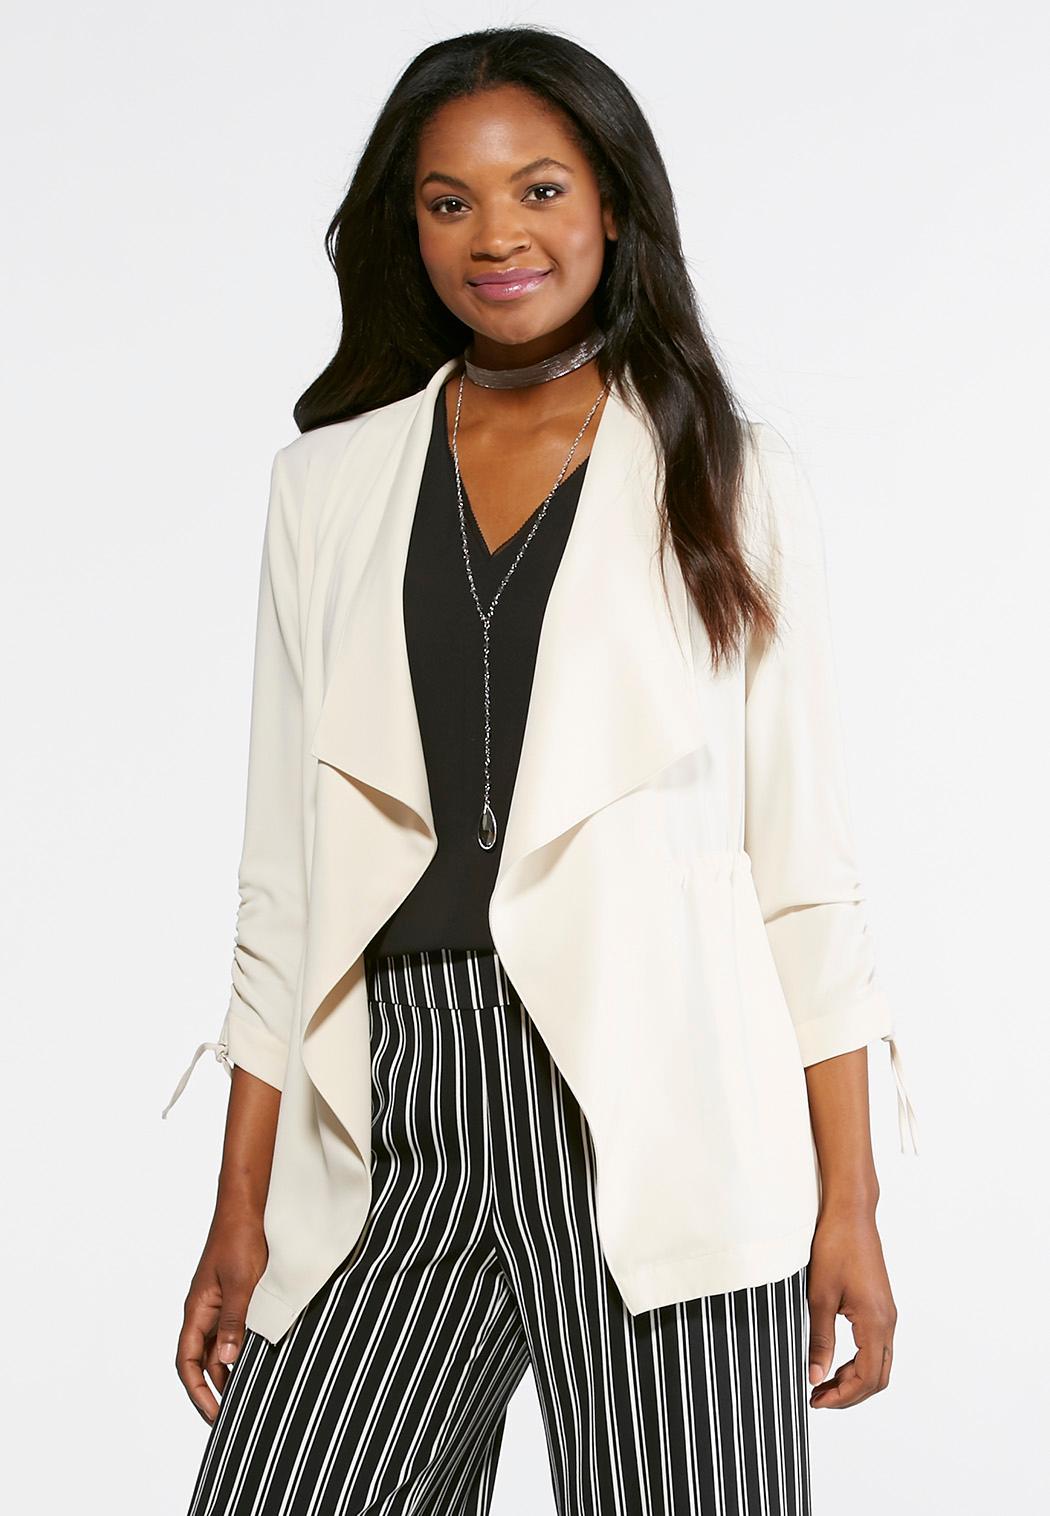 draped lerner products bliss bandits blazer product asymmetrical david drapes jacket